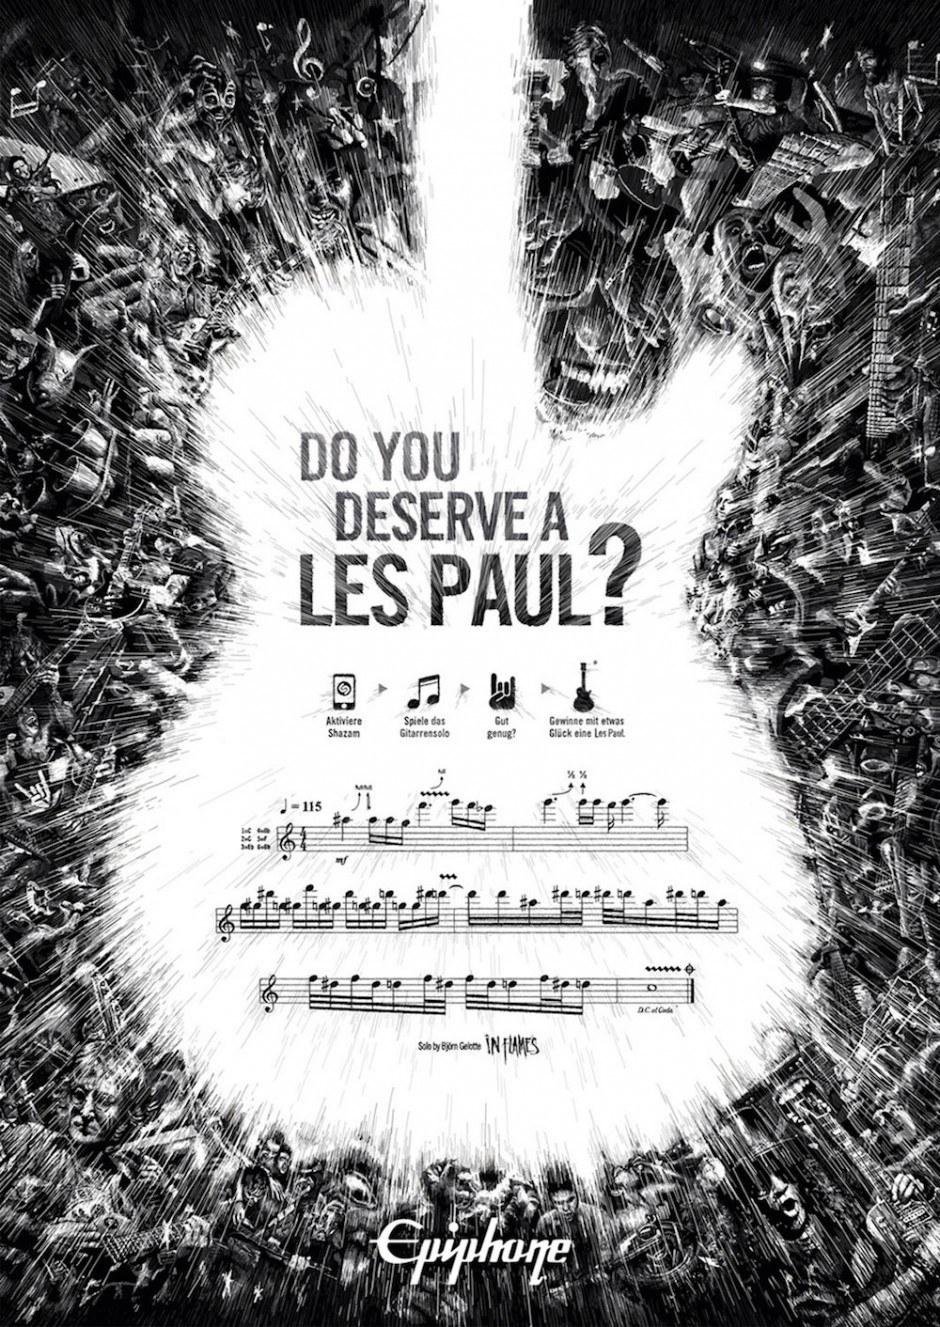 Gold Mobile Apps: Les Paul Skill Check von Serviceplan für Gibson Guitar